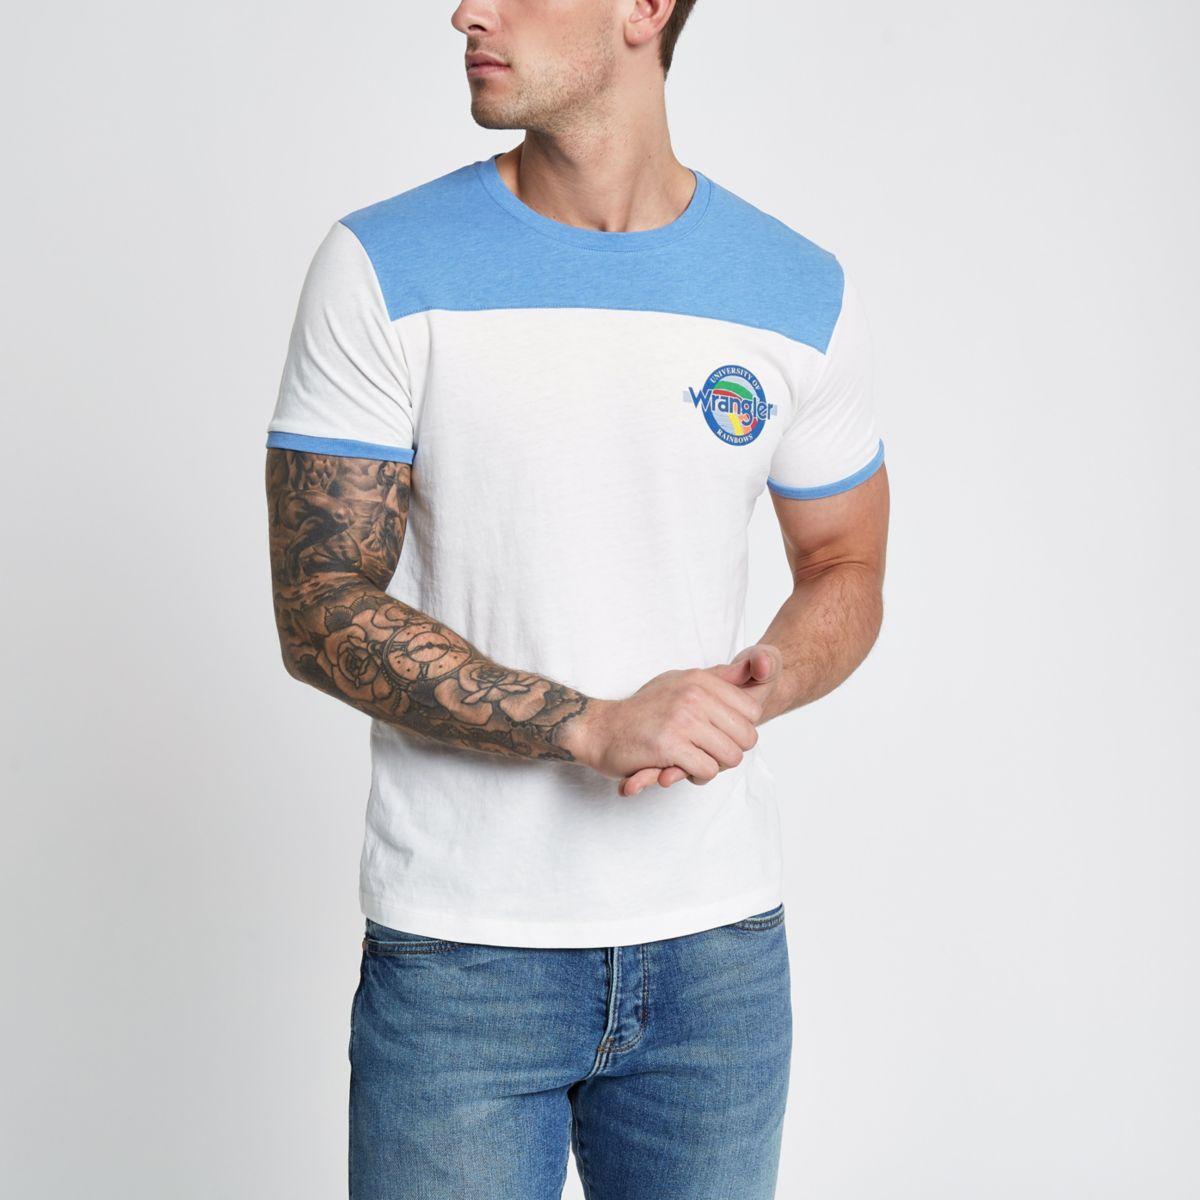 Wrangler – T-shirt manches courtes bleu contrasté